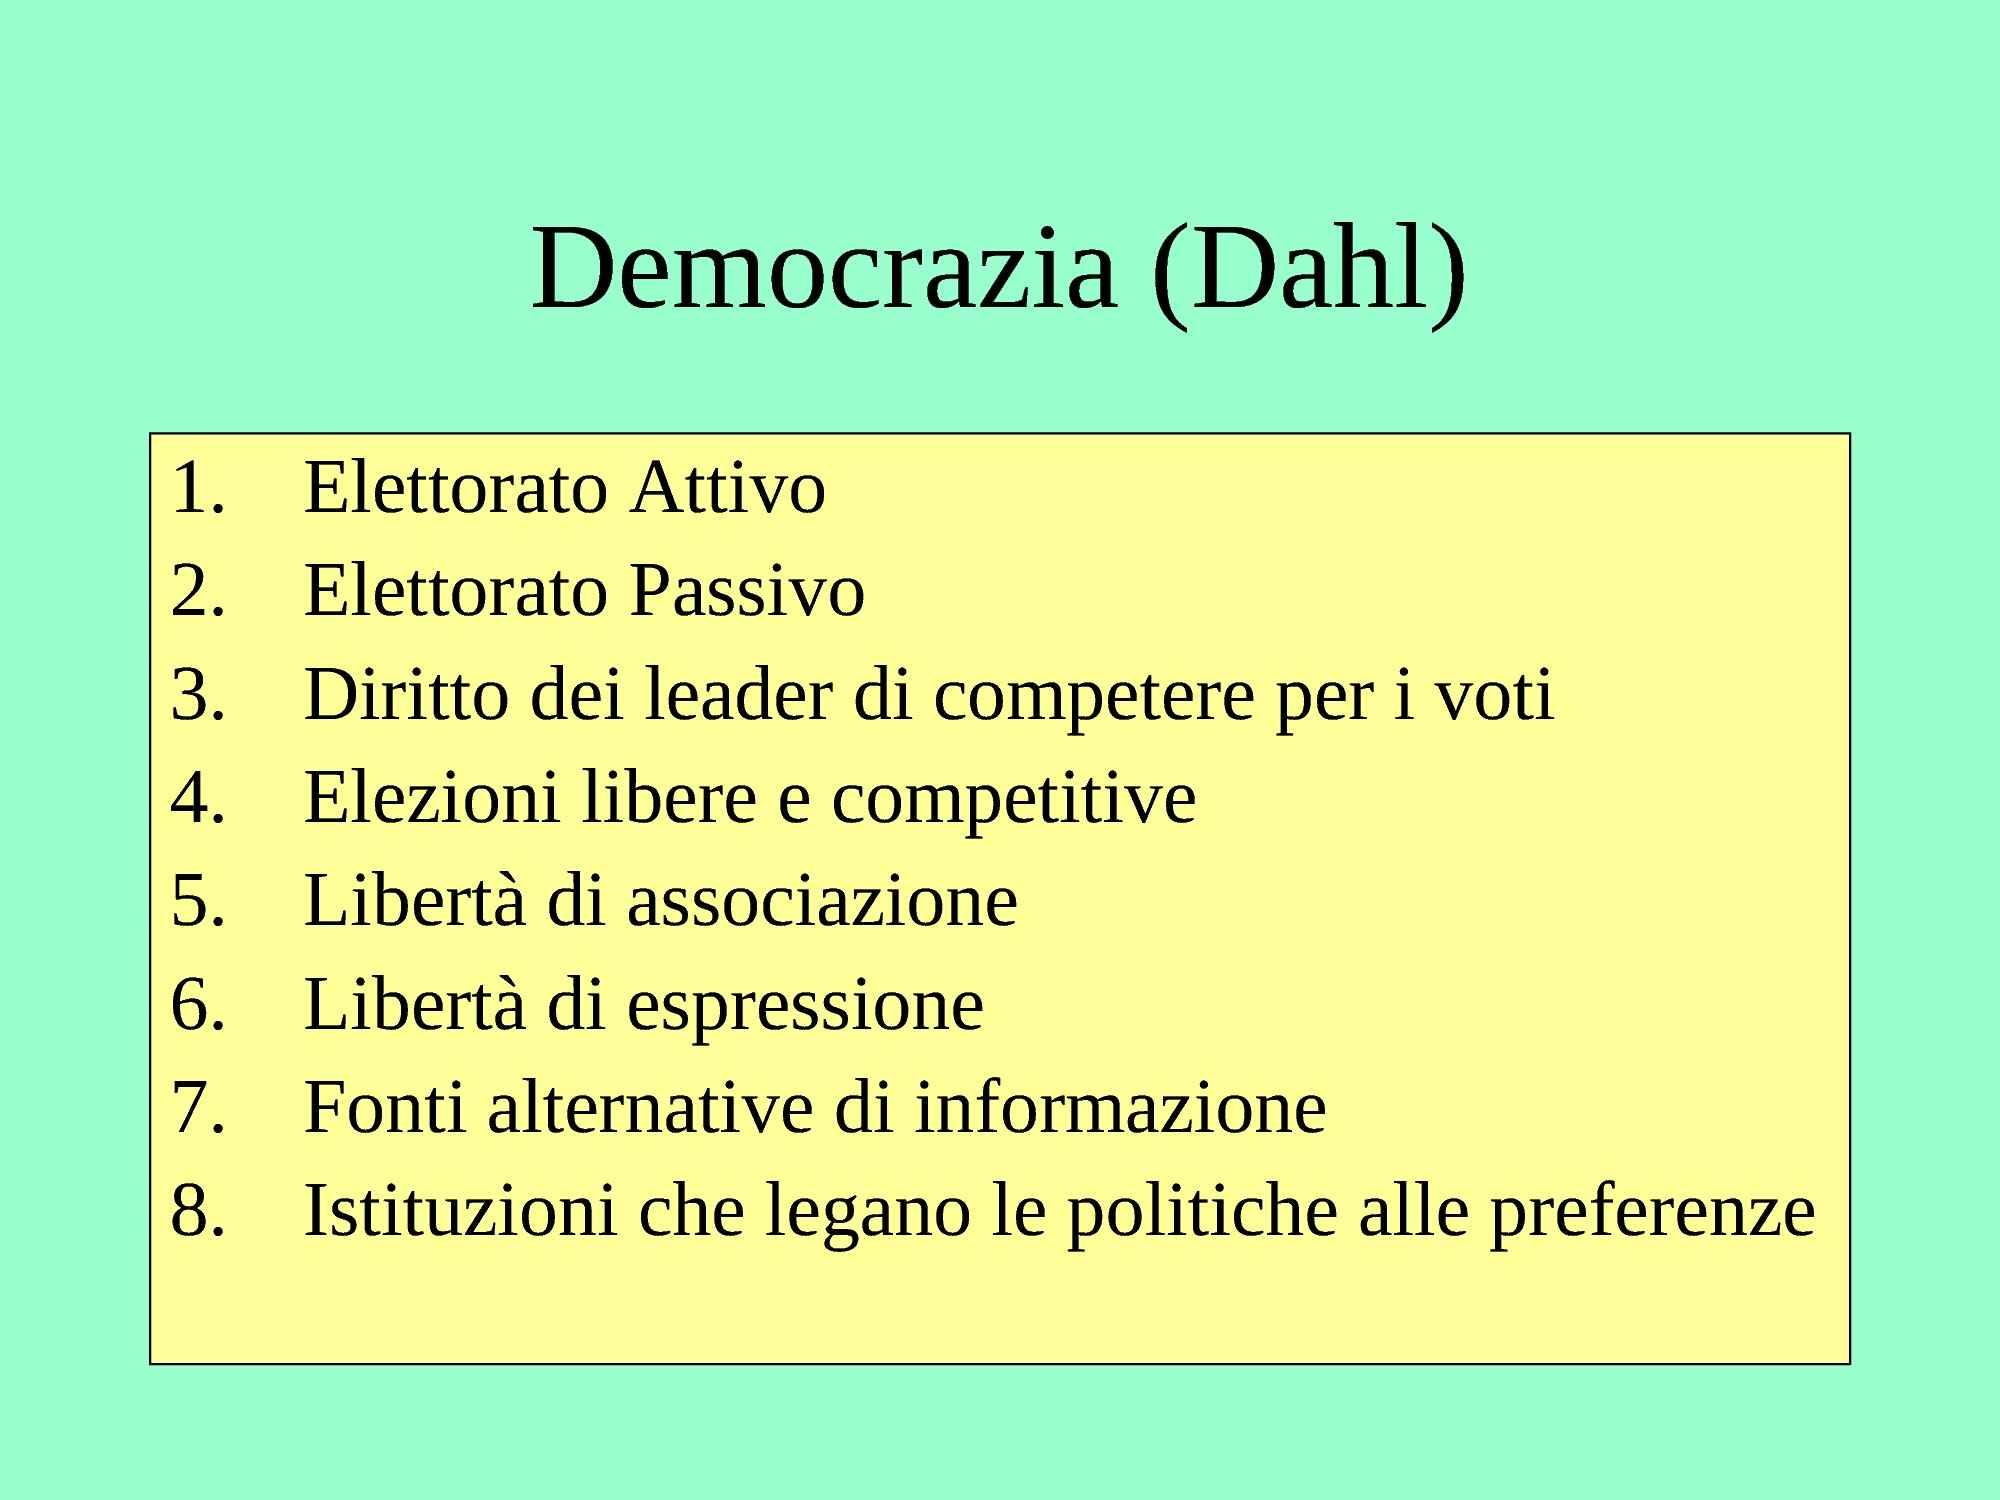 Democrazia - Dahl